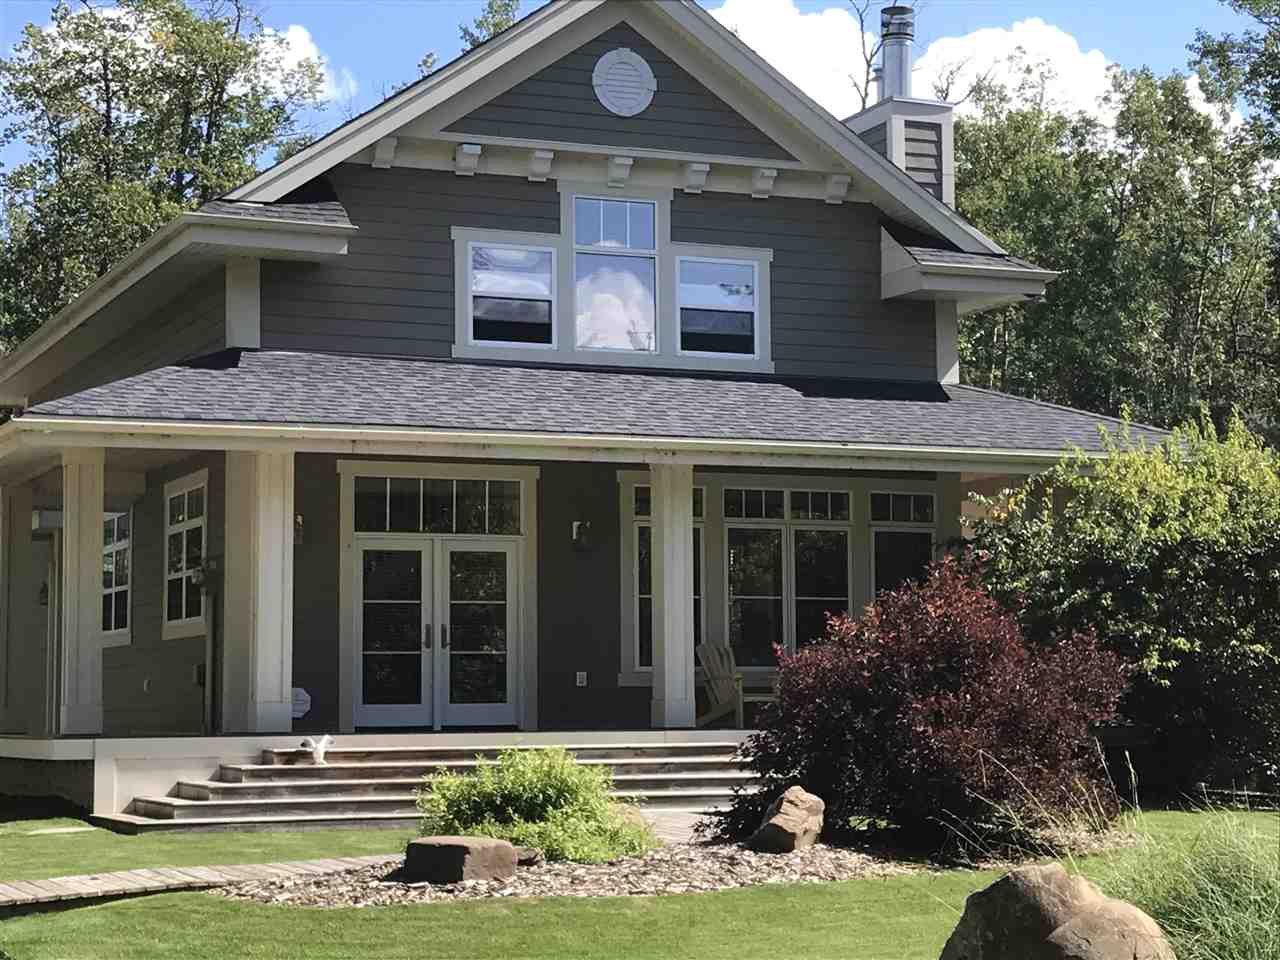 Main Photo: 90 Silver Beach Road: Rural Wetaskiwin County House for sale : MLS®# E4170493